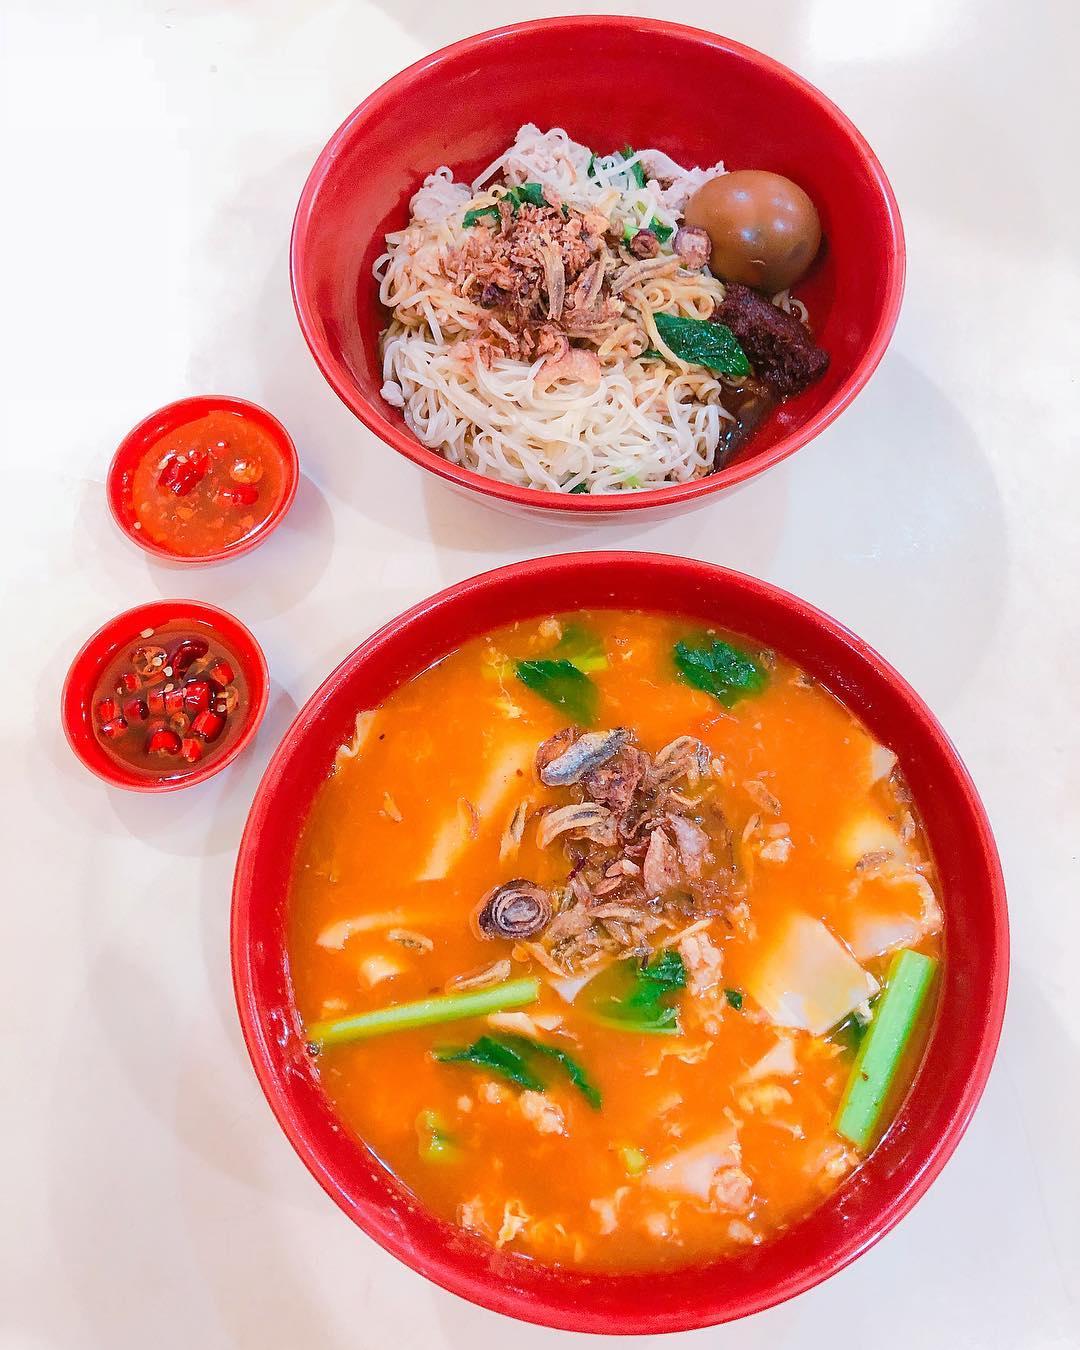 Bukit Batok Food - Ban Mian Fish Soup